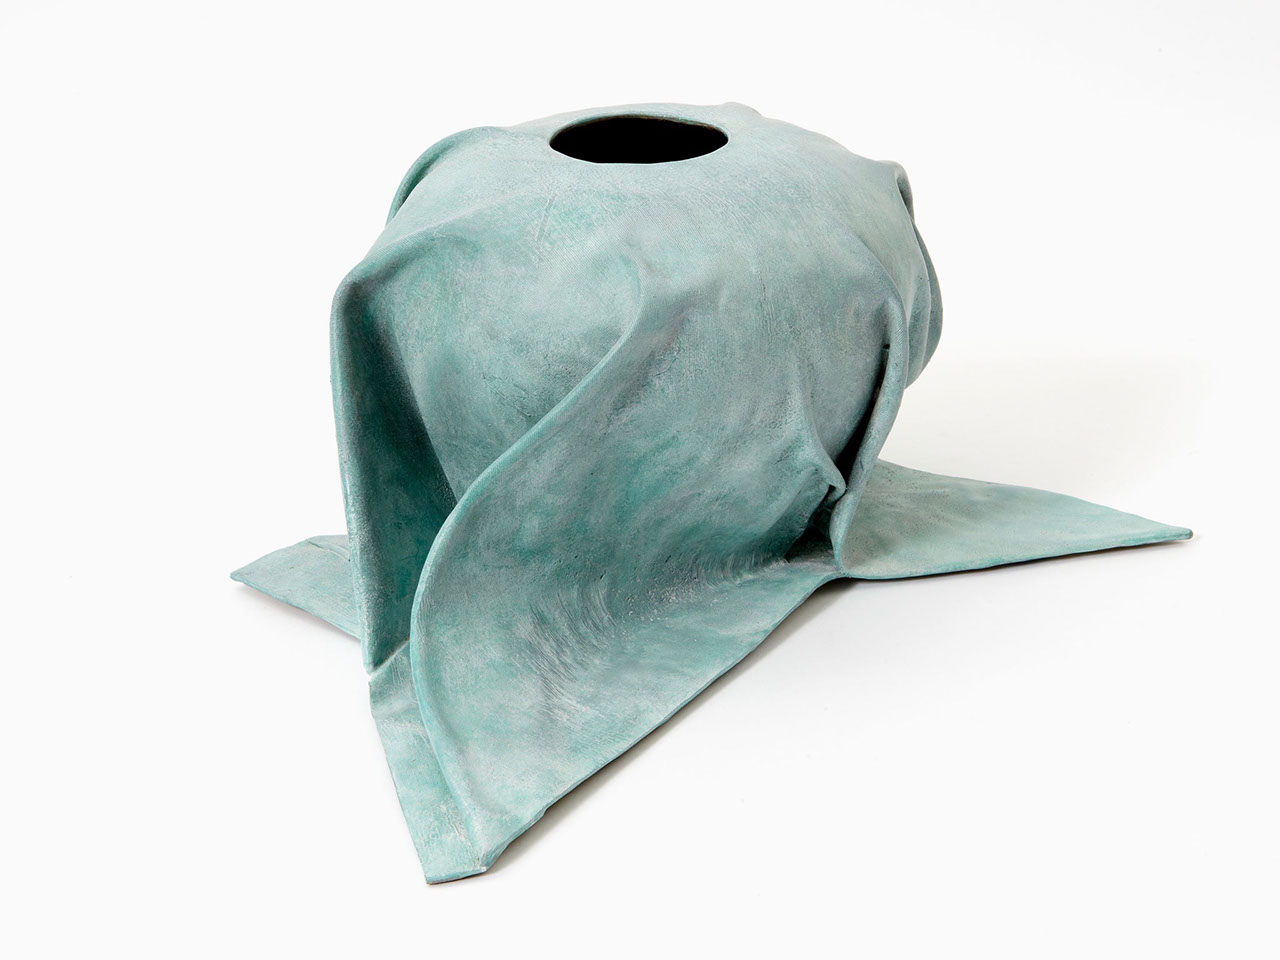 jens-praet-dressed-ware-series-pej-rikke-skytte